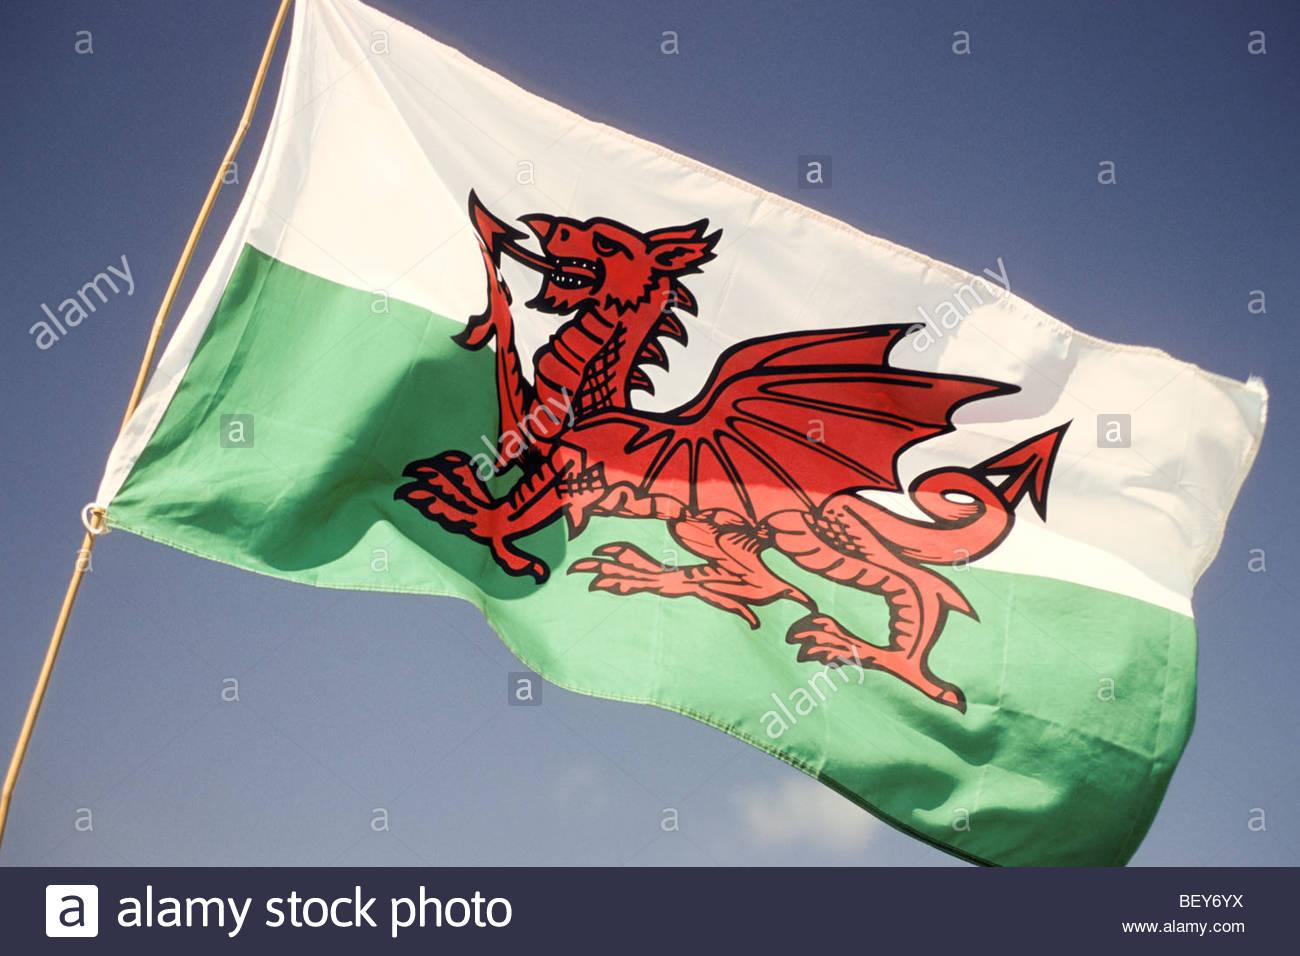 Flag Wales Imágenes De Stock & Flag Wales Fotos De Stock - Alamy